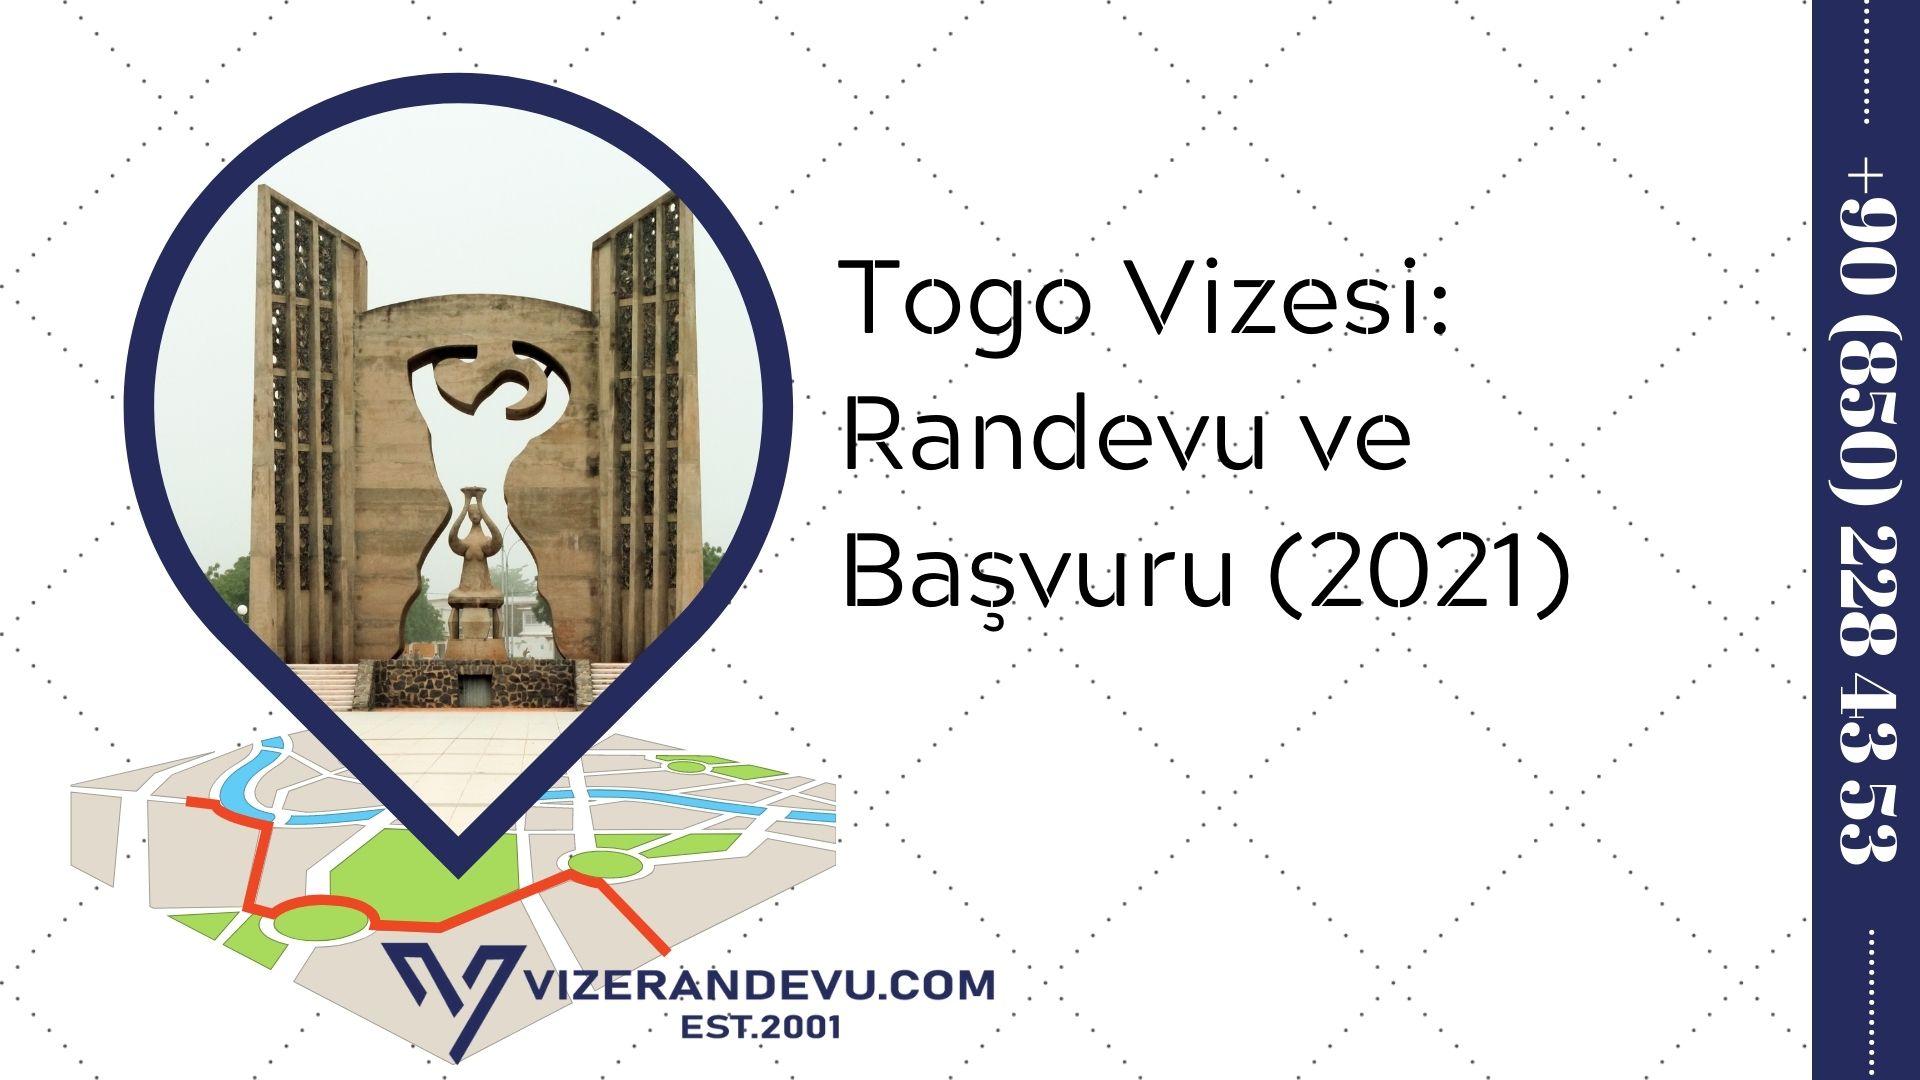 Togo Vizesi: Randevu ve Başvuru (2021)